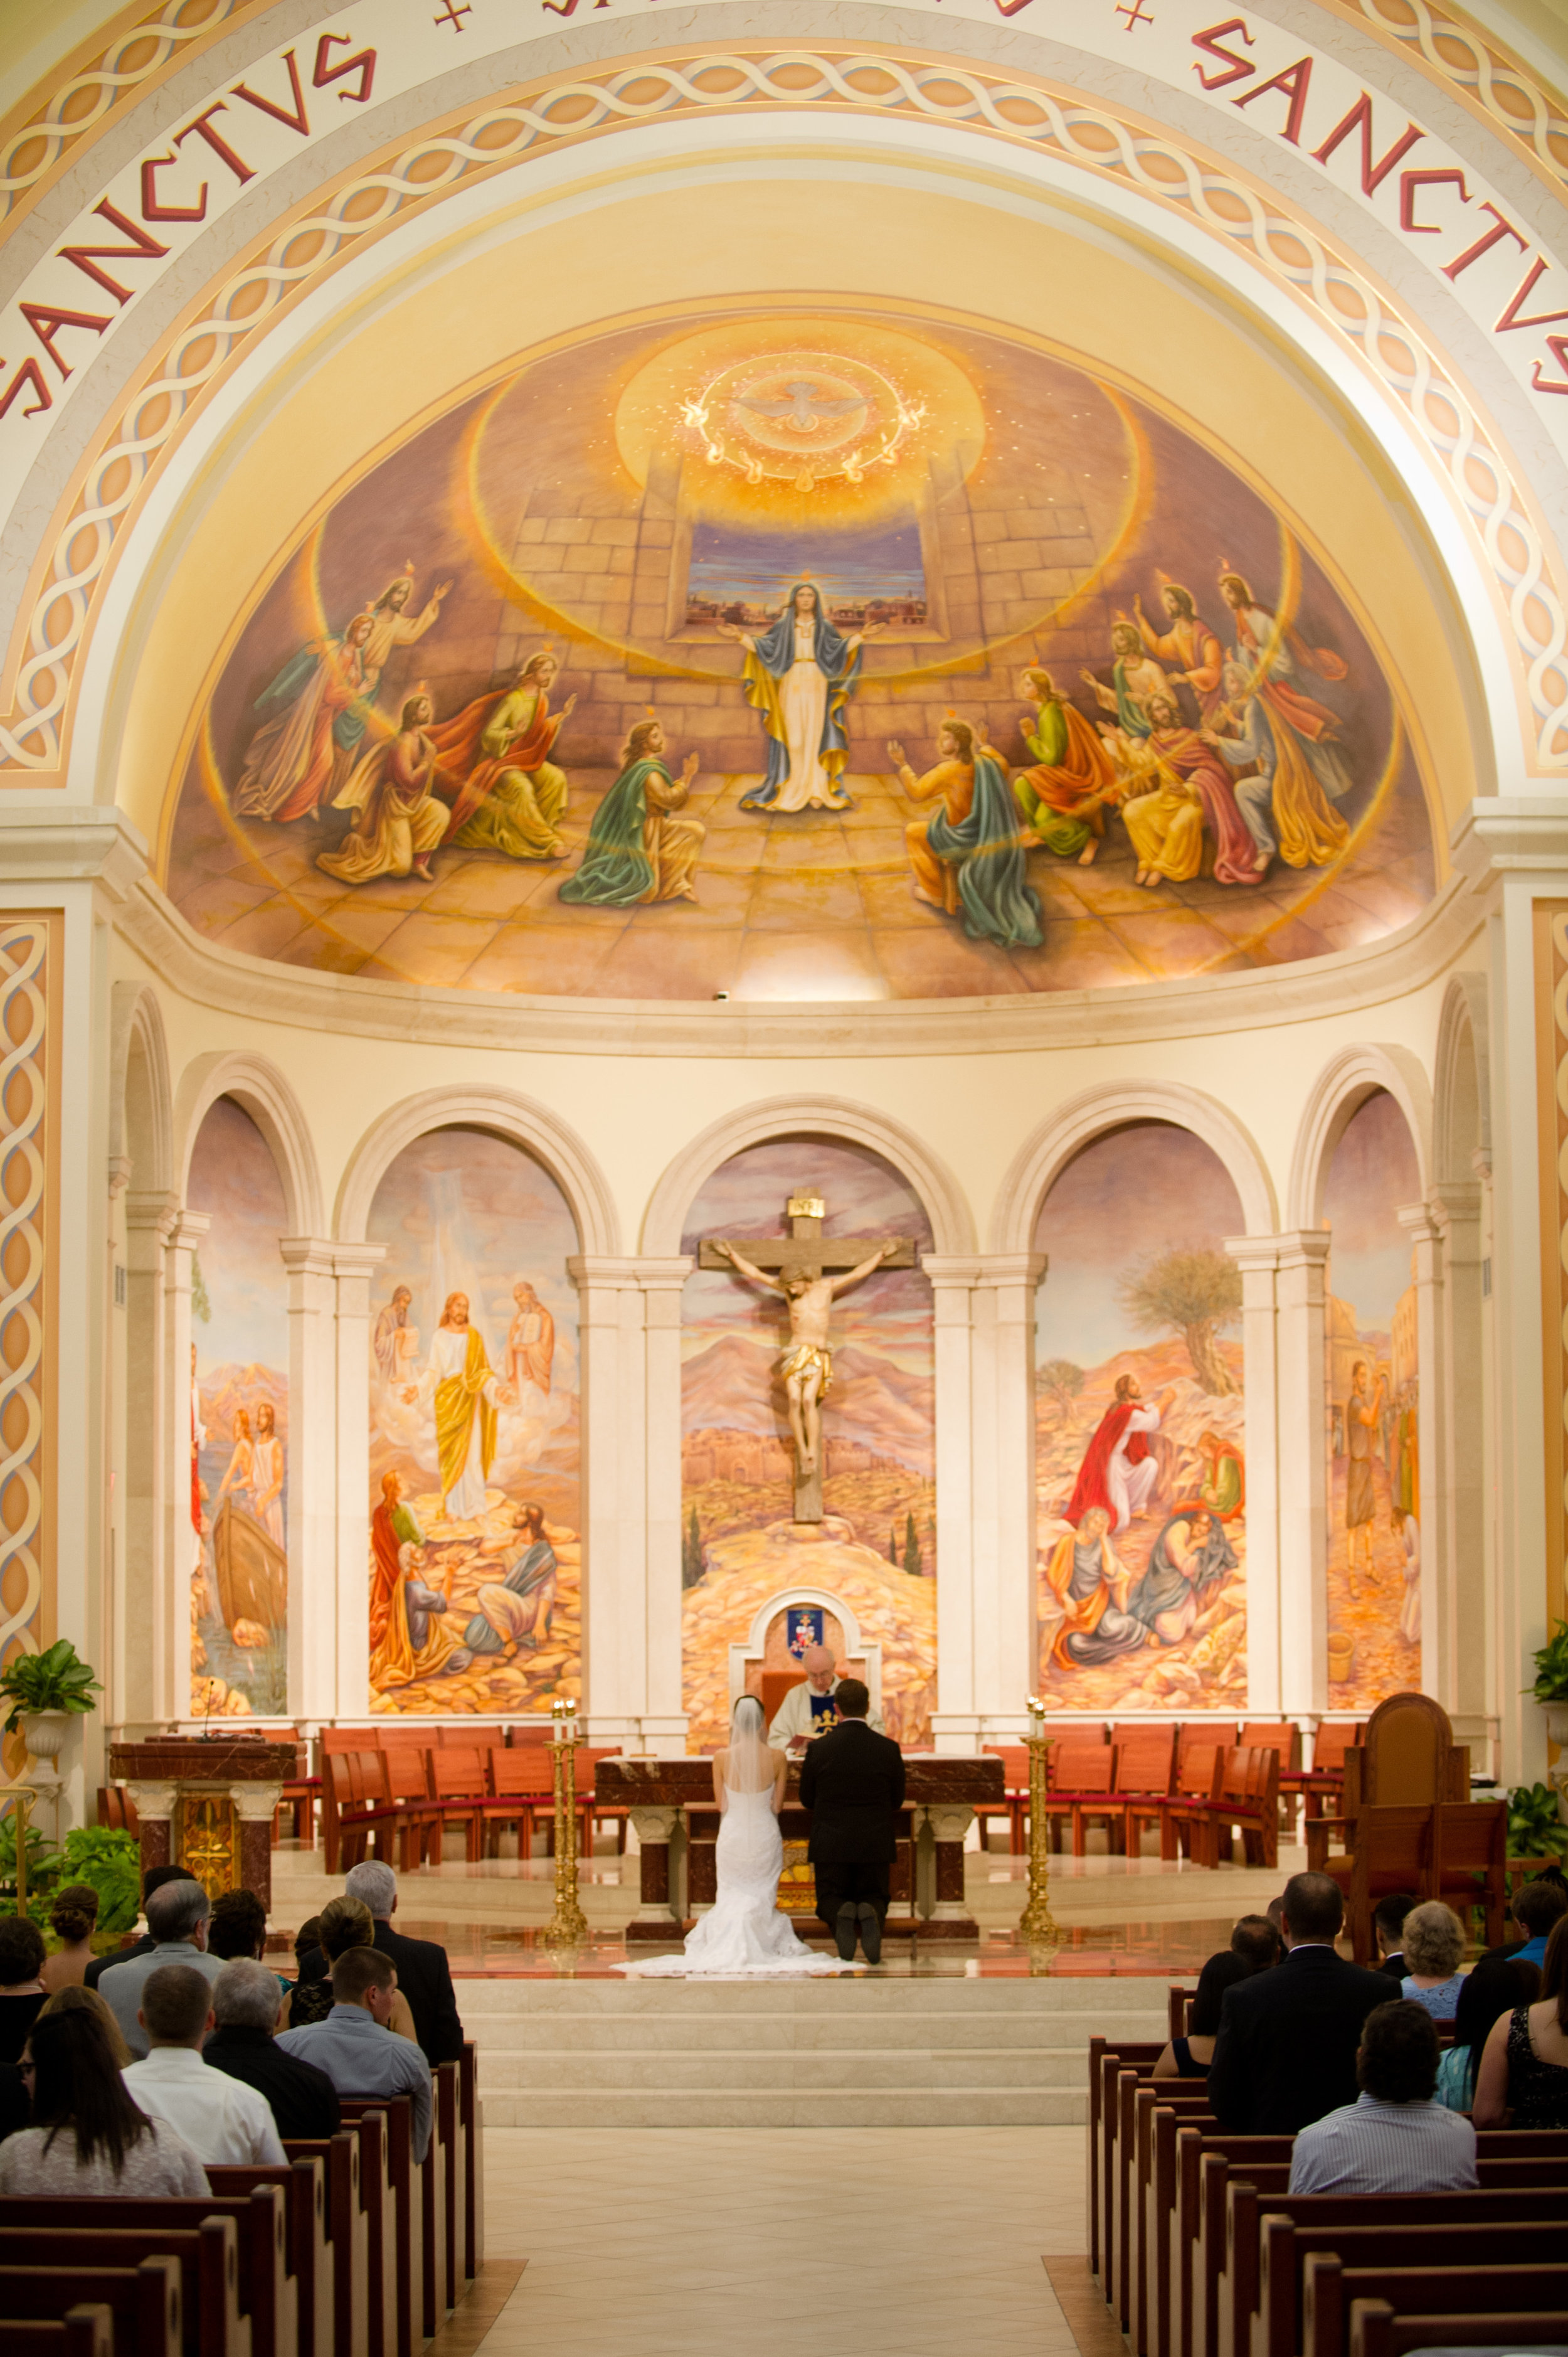 St. James Orlando Wedding Photographer